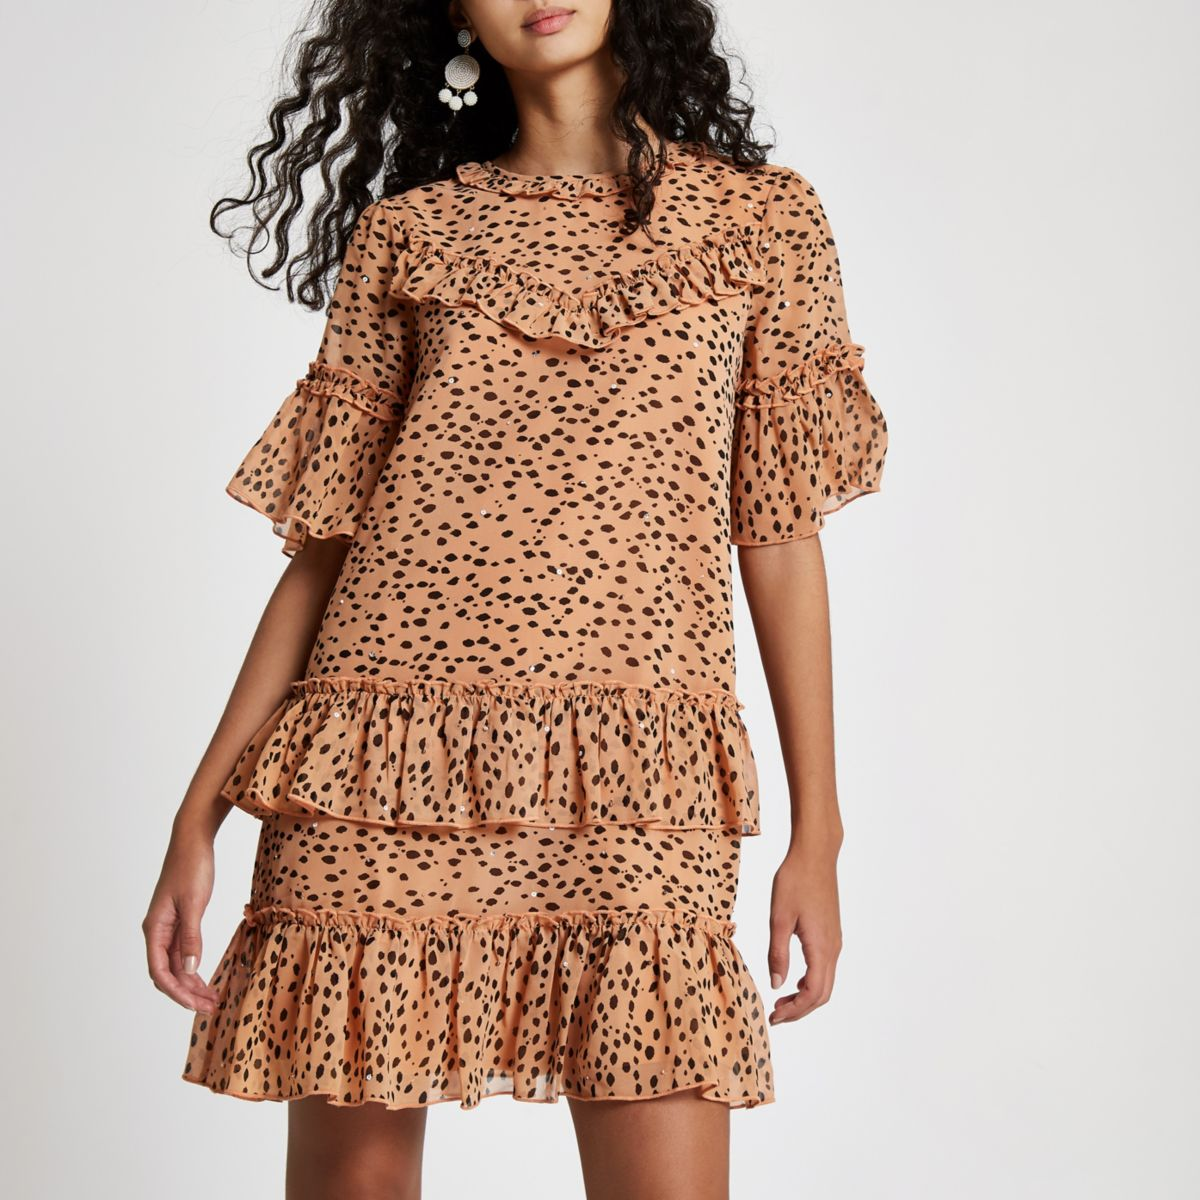 Beige leopard print sequin swing dress